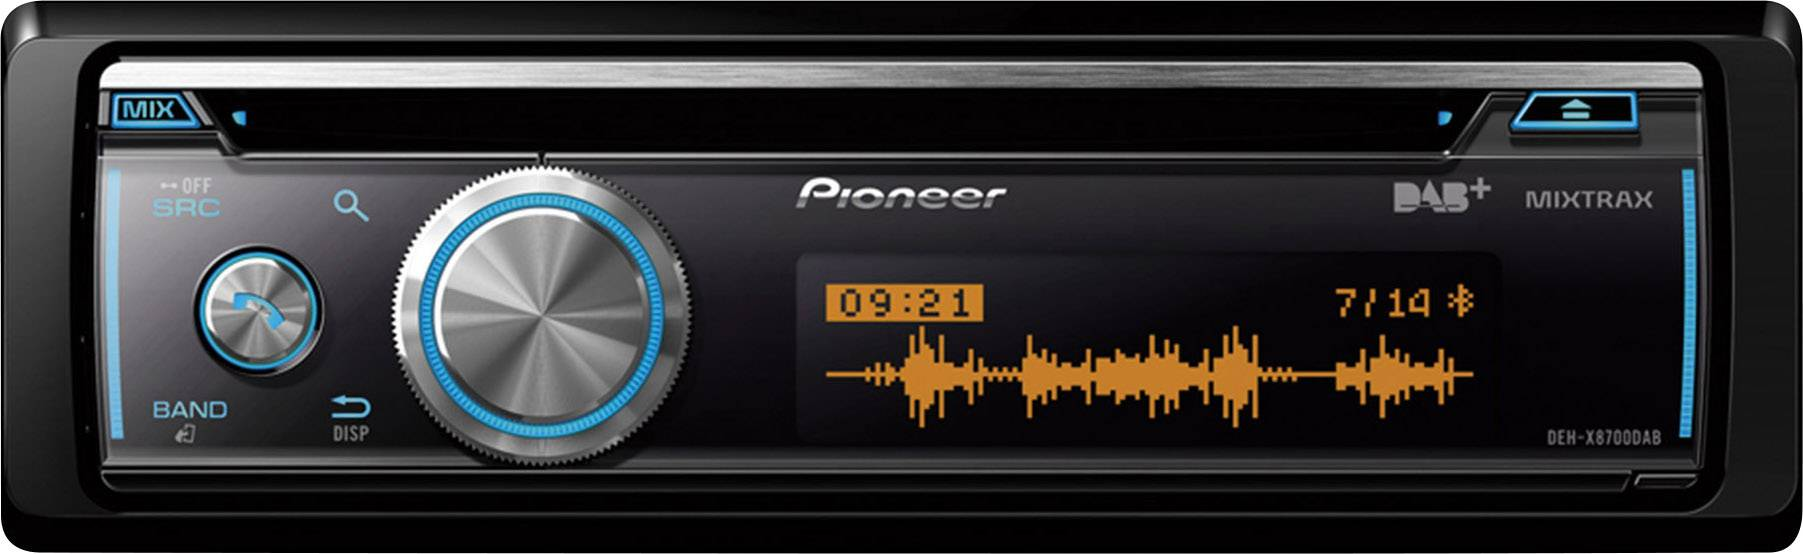 Schema Collegamento Autoradio Pioneer : Pioneer deh x8700dab autoradio collegamento per controllo remoto da